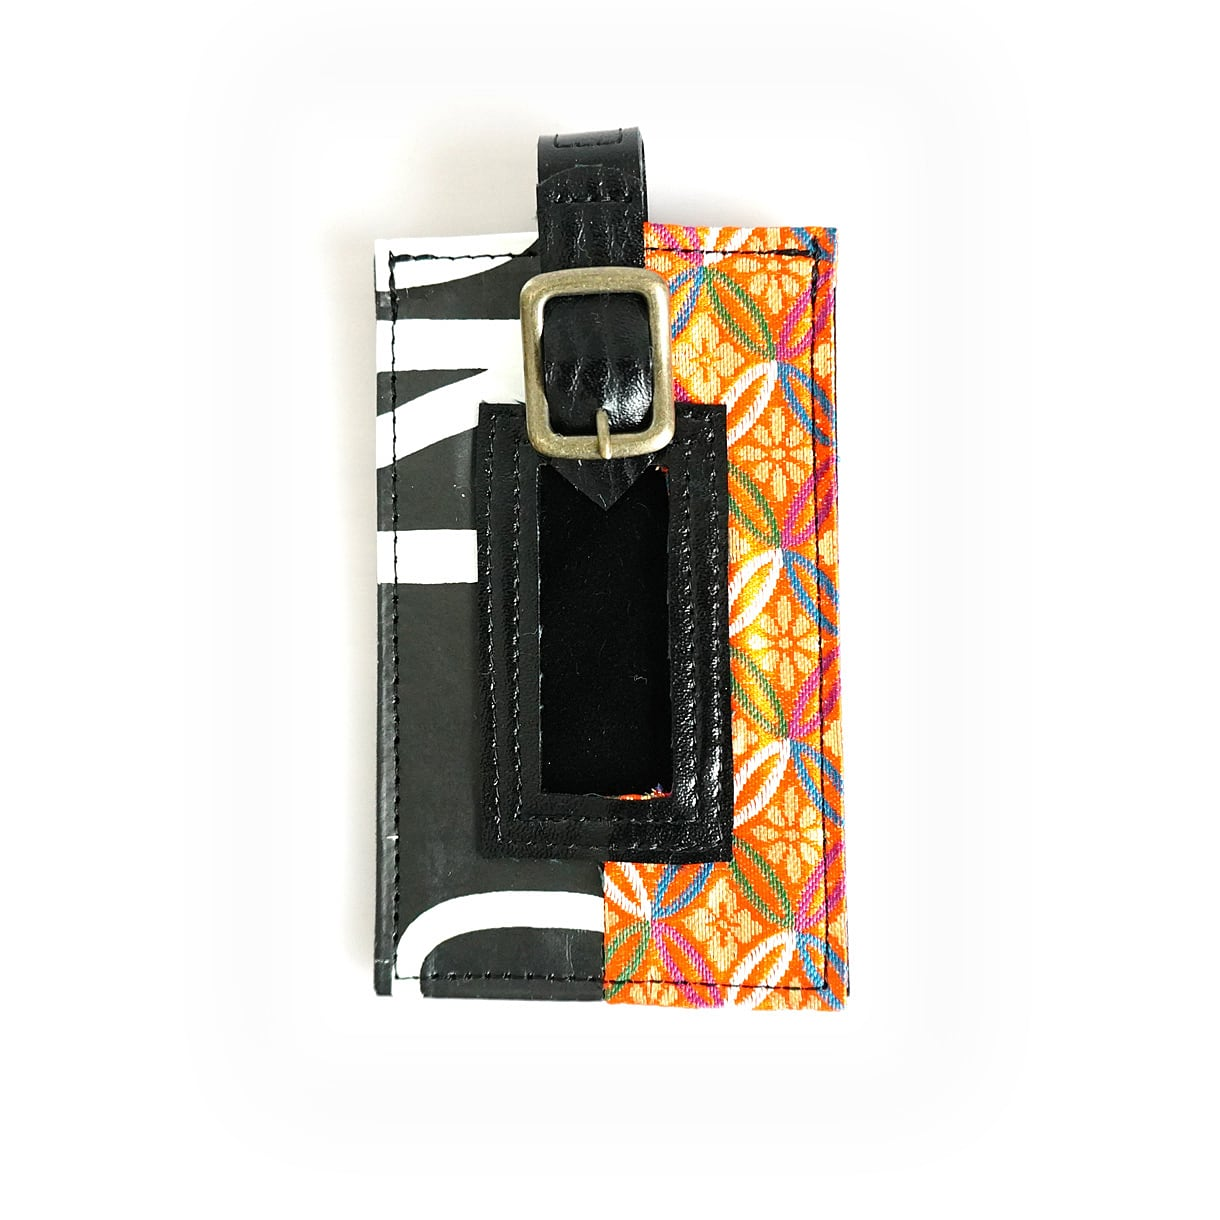 IC card case / ICG-0006